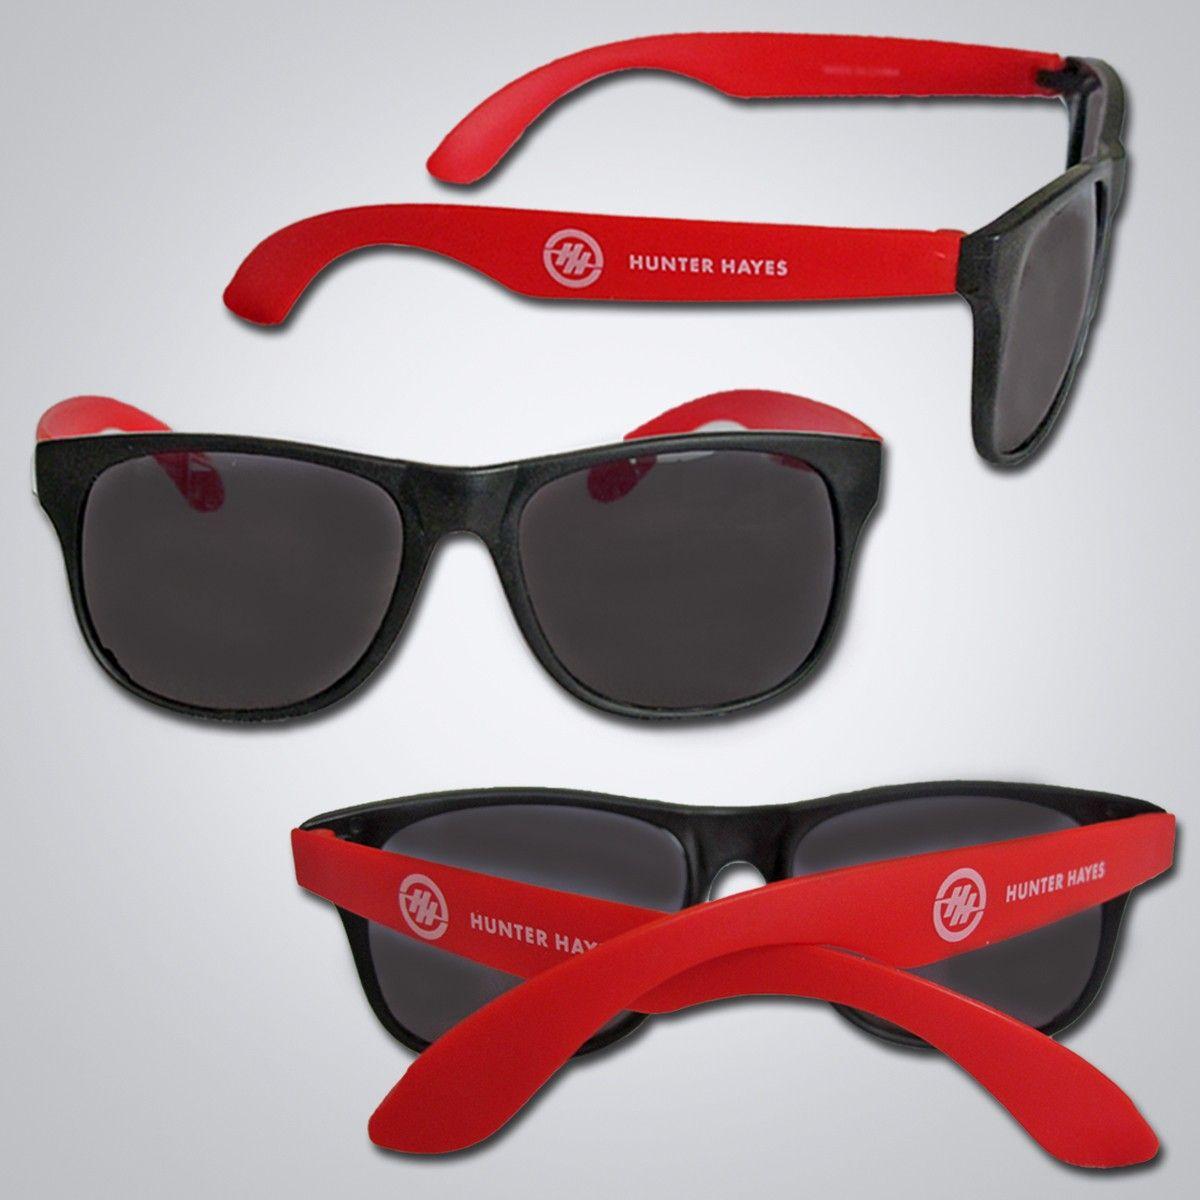 Love the glasses! | нυитєя нαyєร | Pinterest | Hunter ...  |Hunter Hayes Glasses